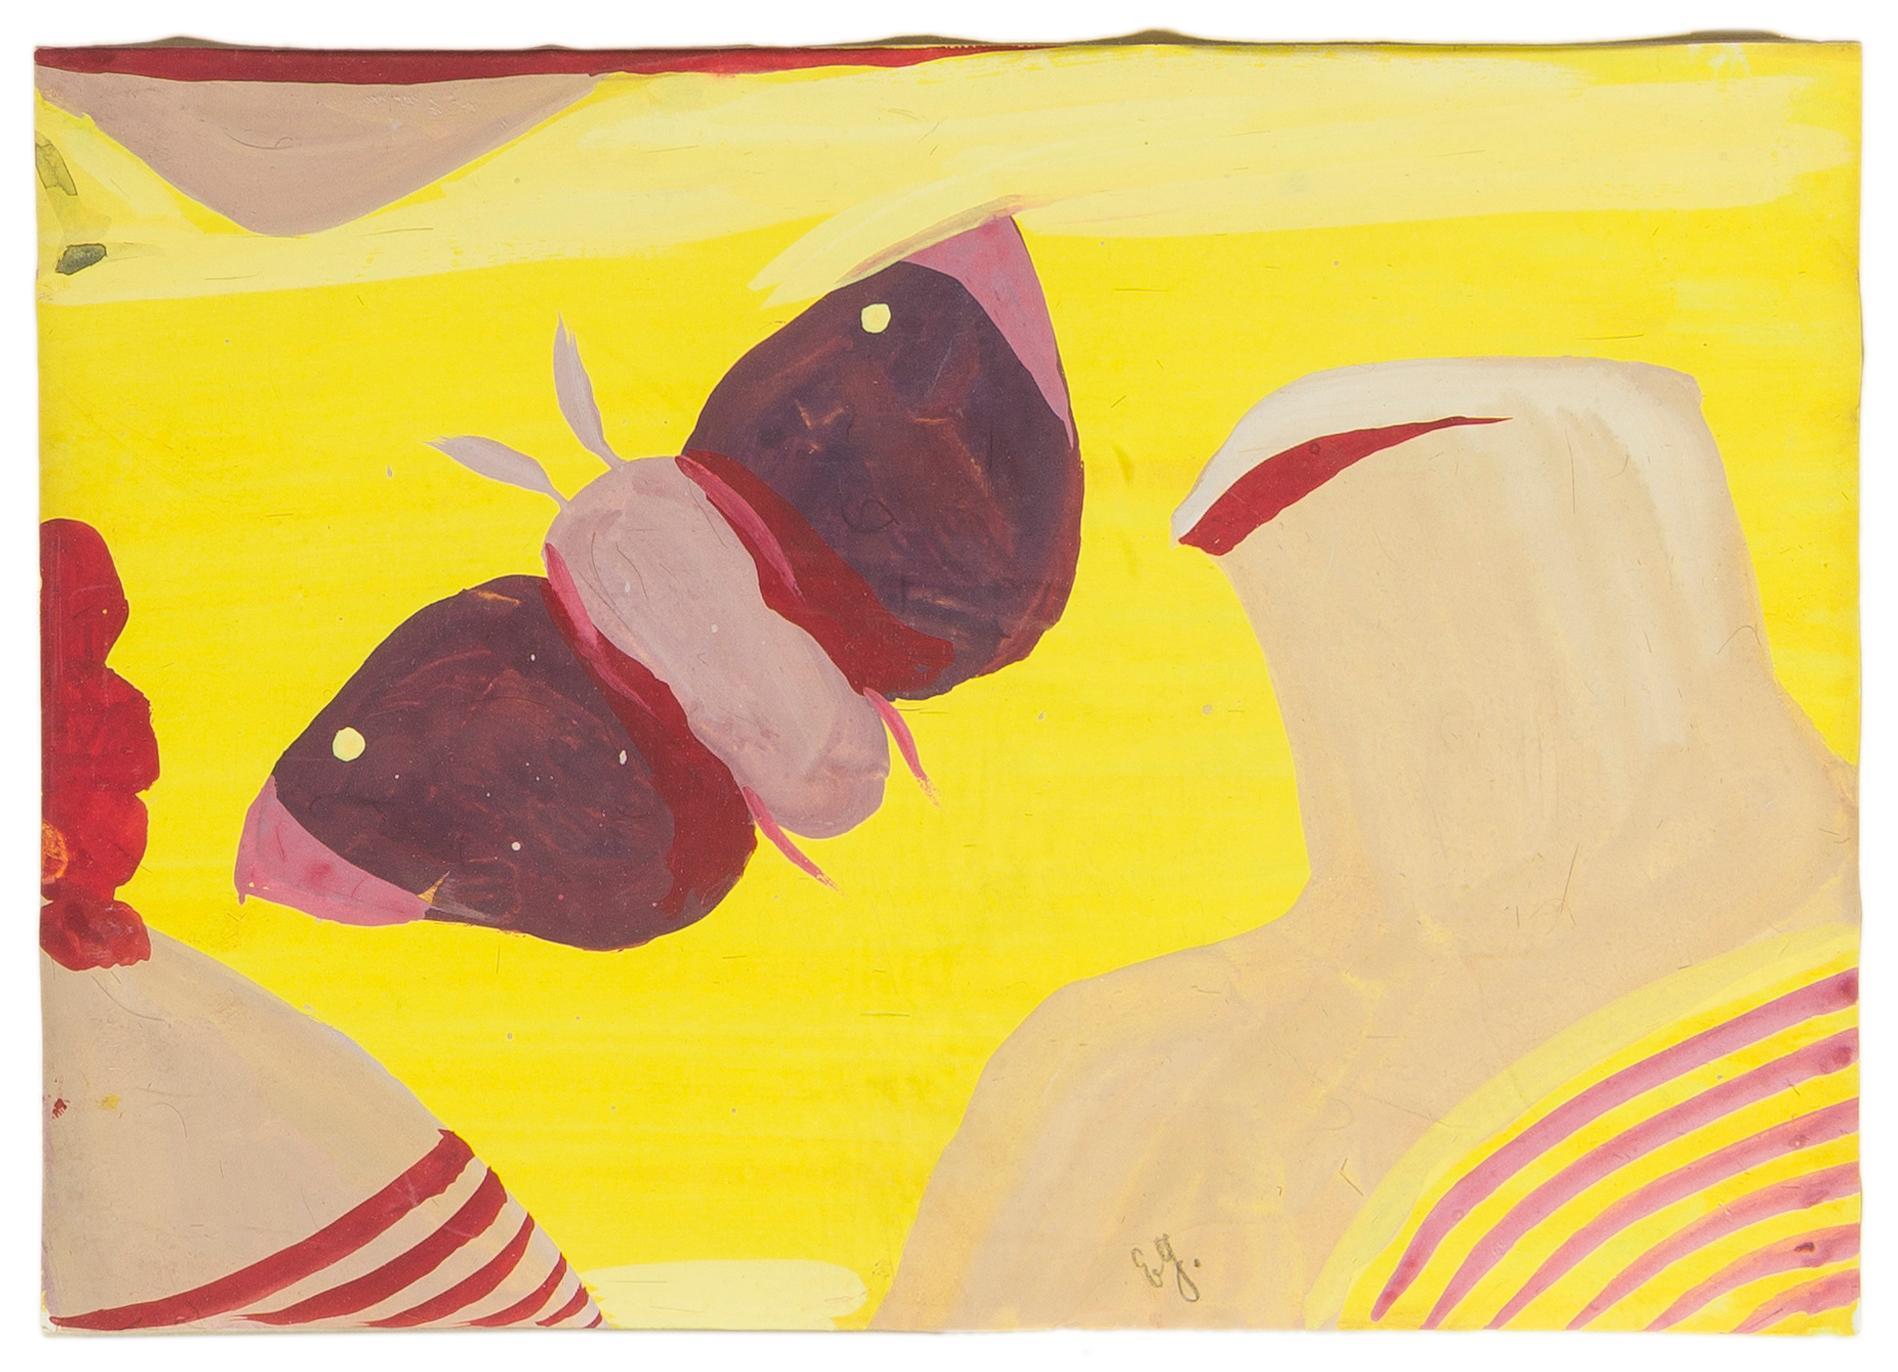 "Eugène Gabritschevsky, (1892-1980 Russian), Untitled (Butterfly), Gouache on paper under Plexiglas, Sheet: 8"" H x 11.5"" W"